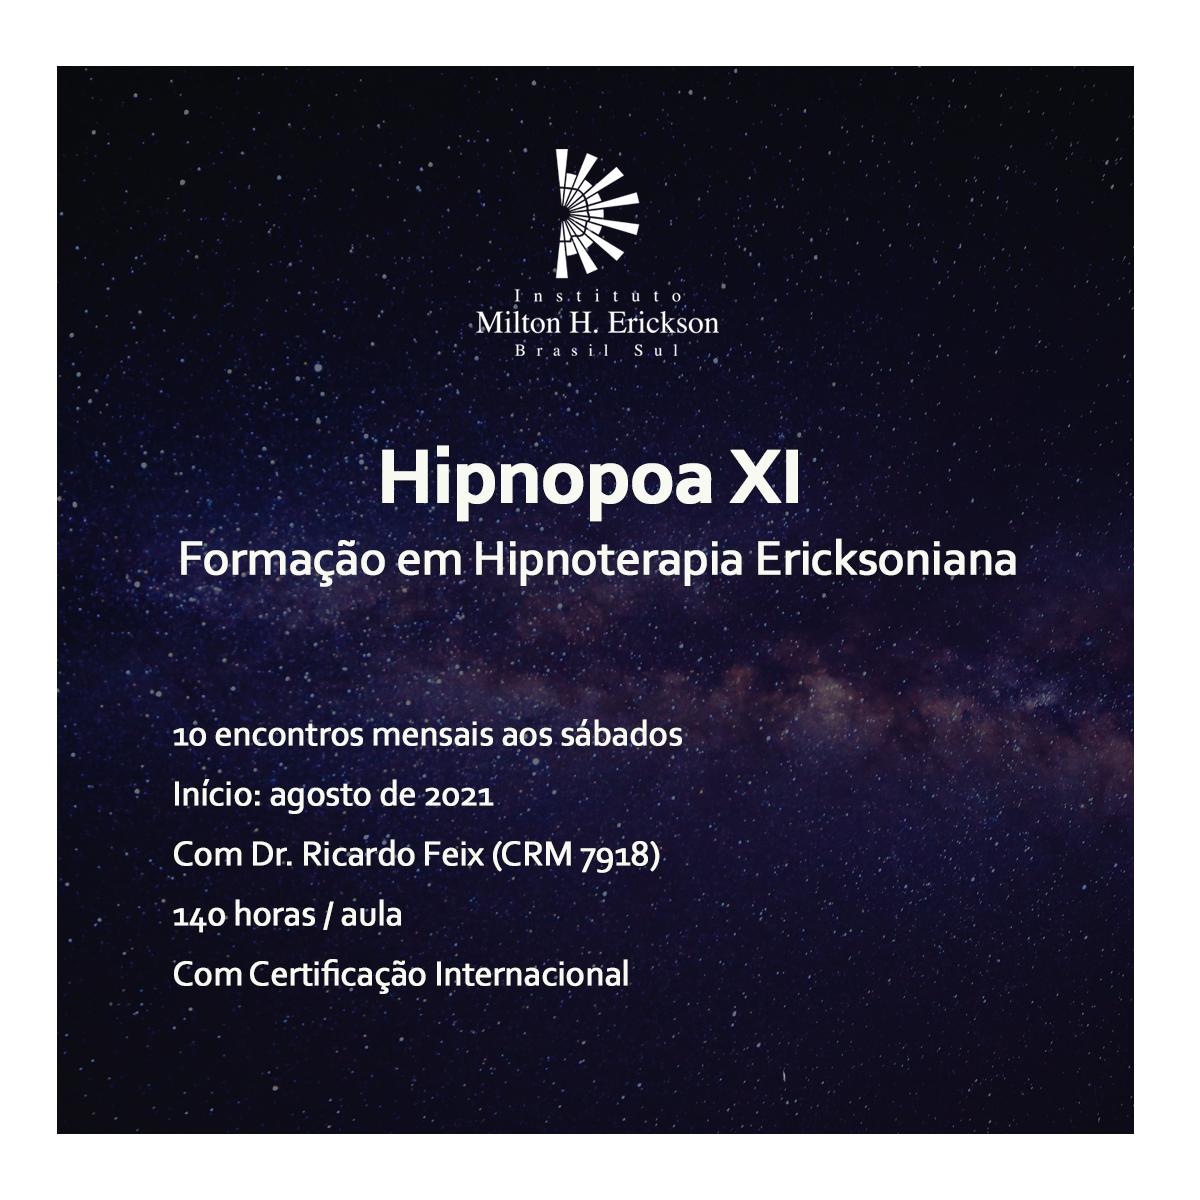 Hipnopoa XI